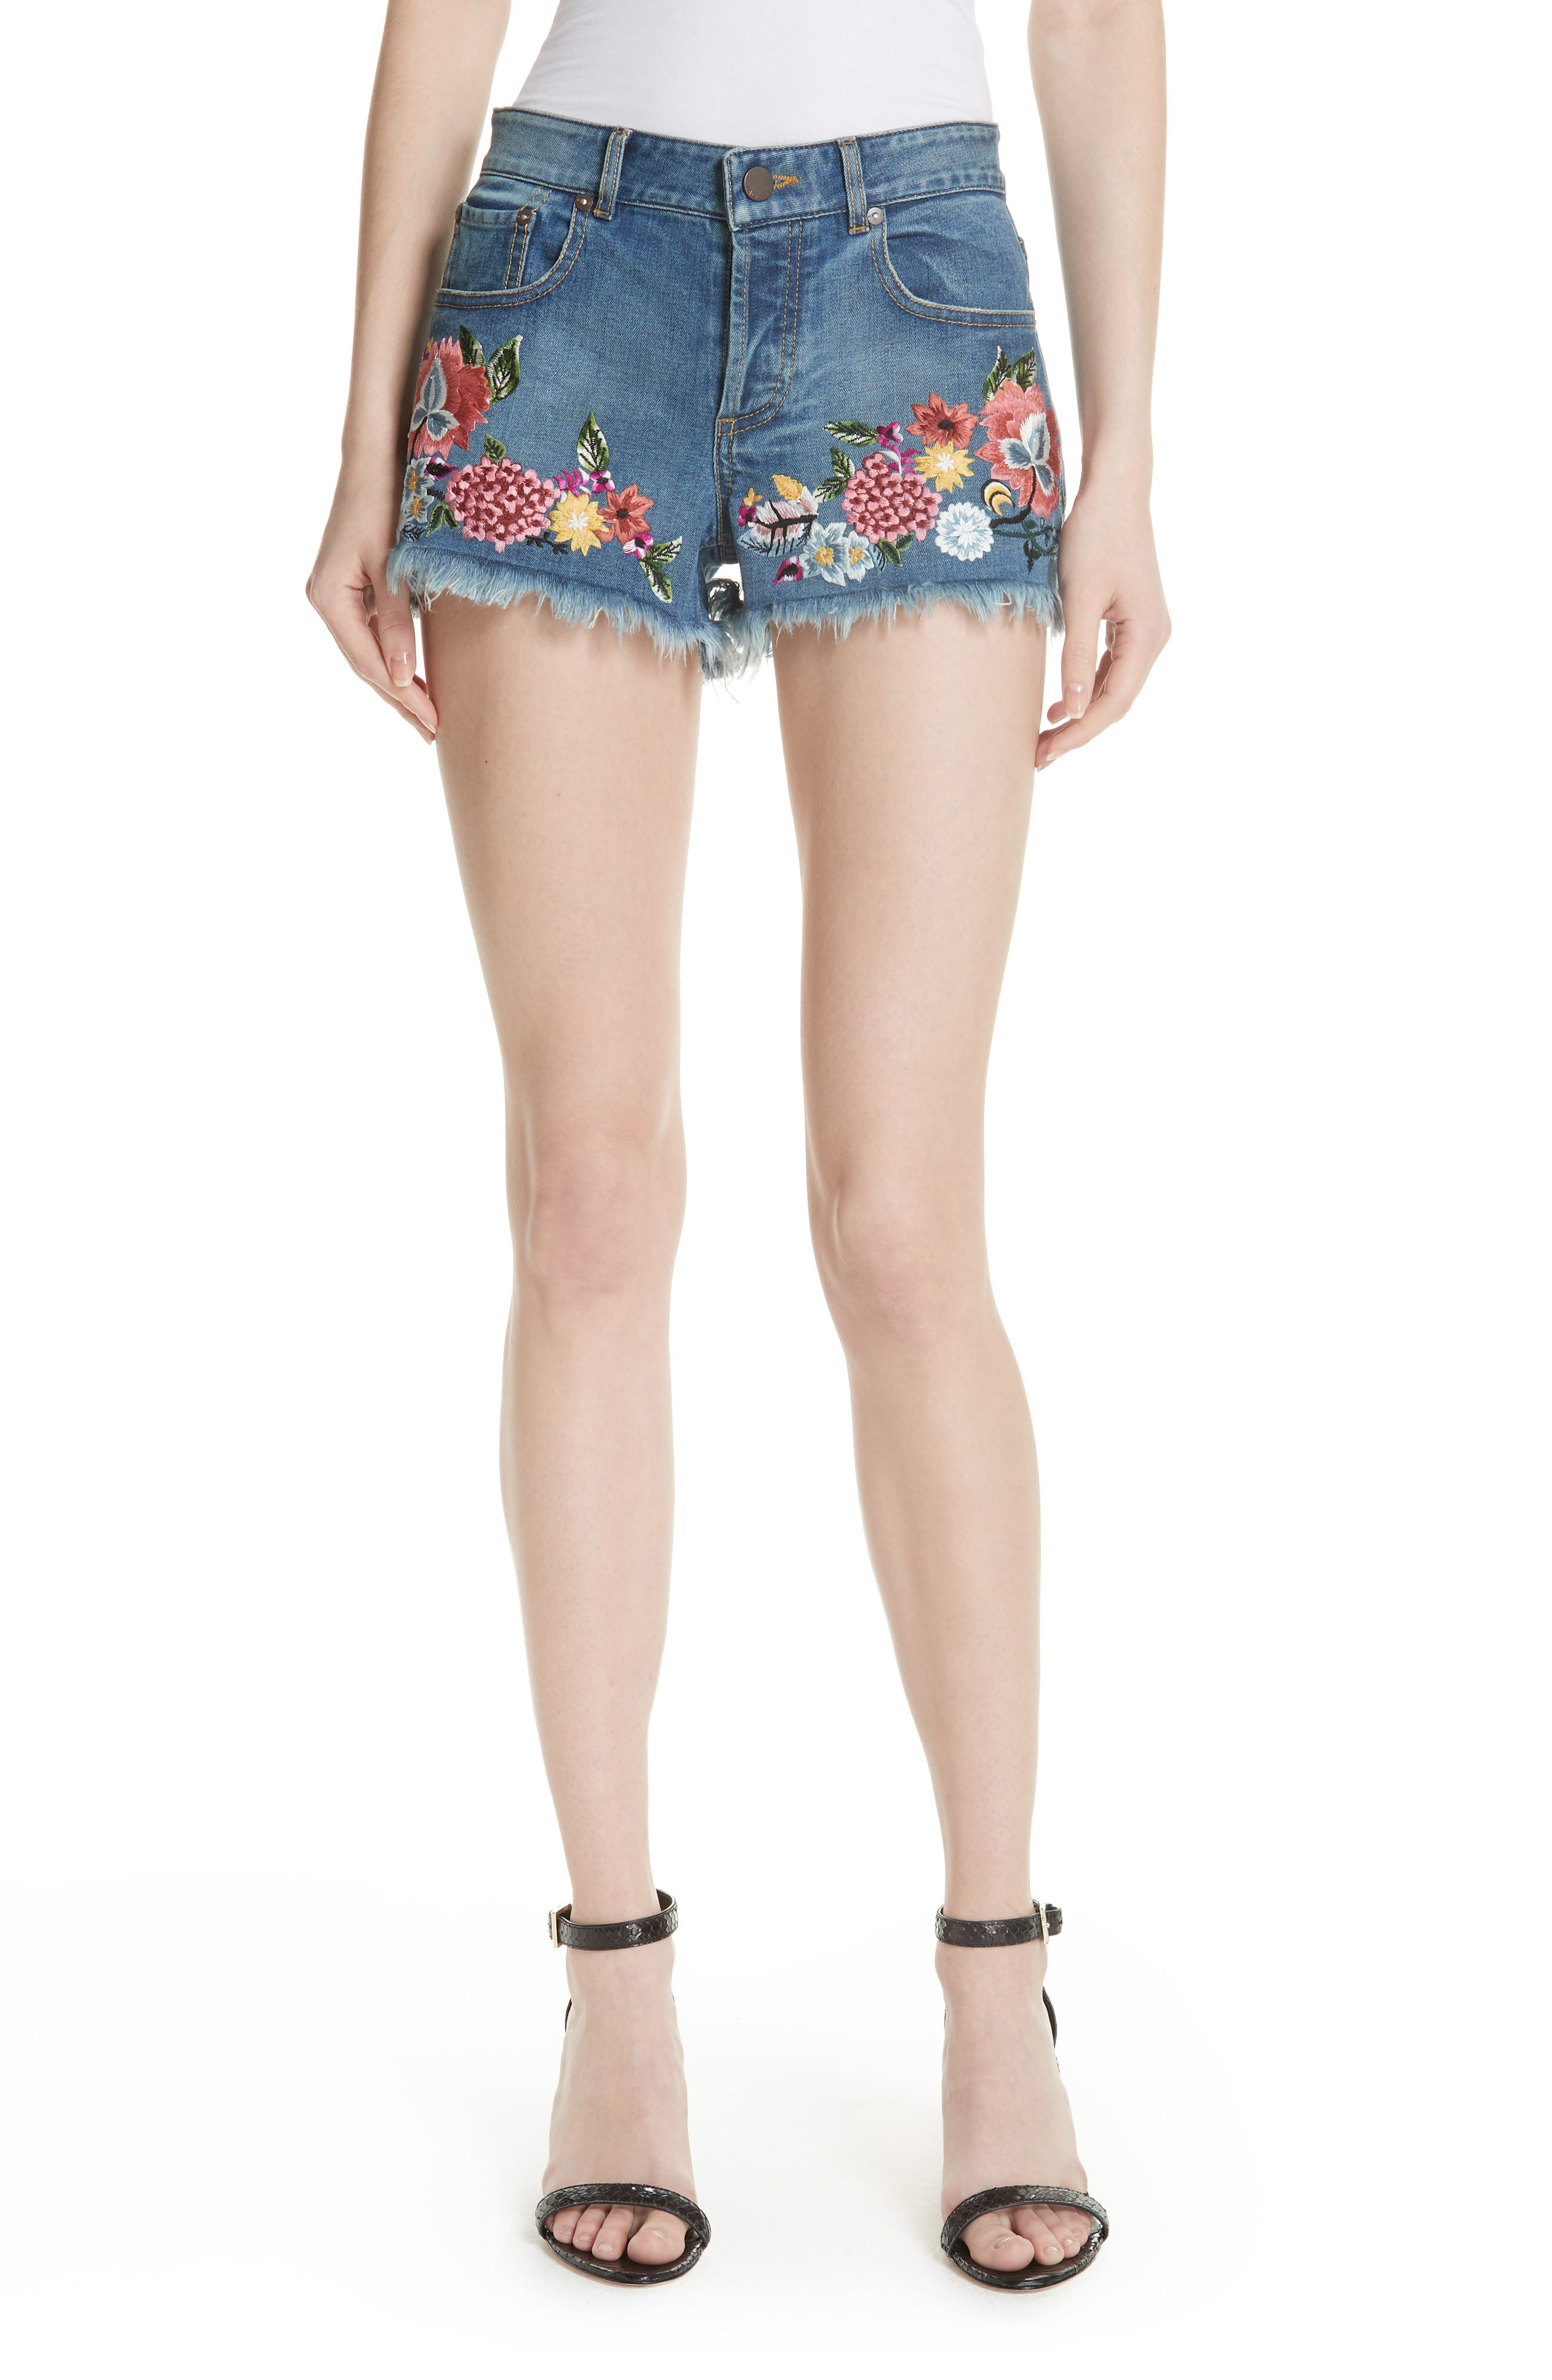 AO.LA Embroidered Denim Shorts,                             Main thumbnail 1, color,                             Multi